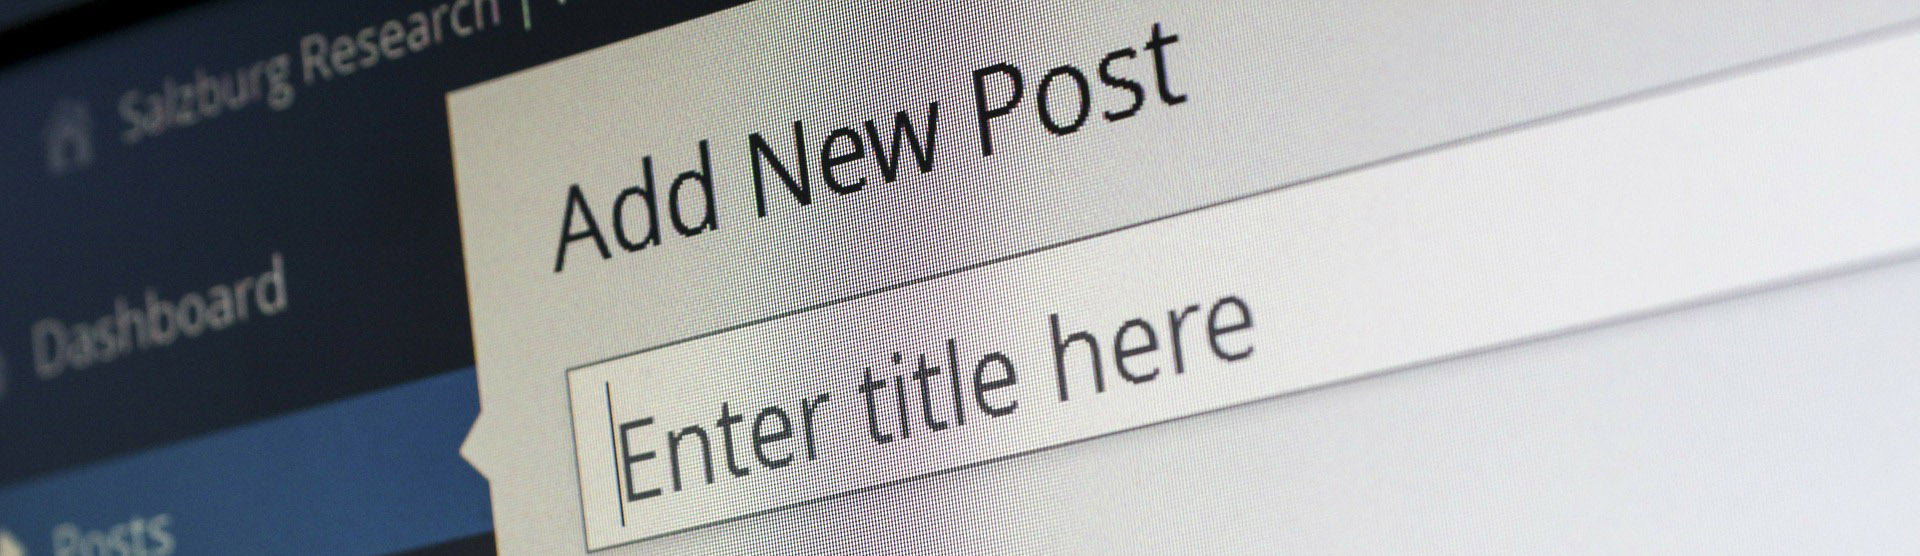 redaction web seo - blog - fréquence de publication